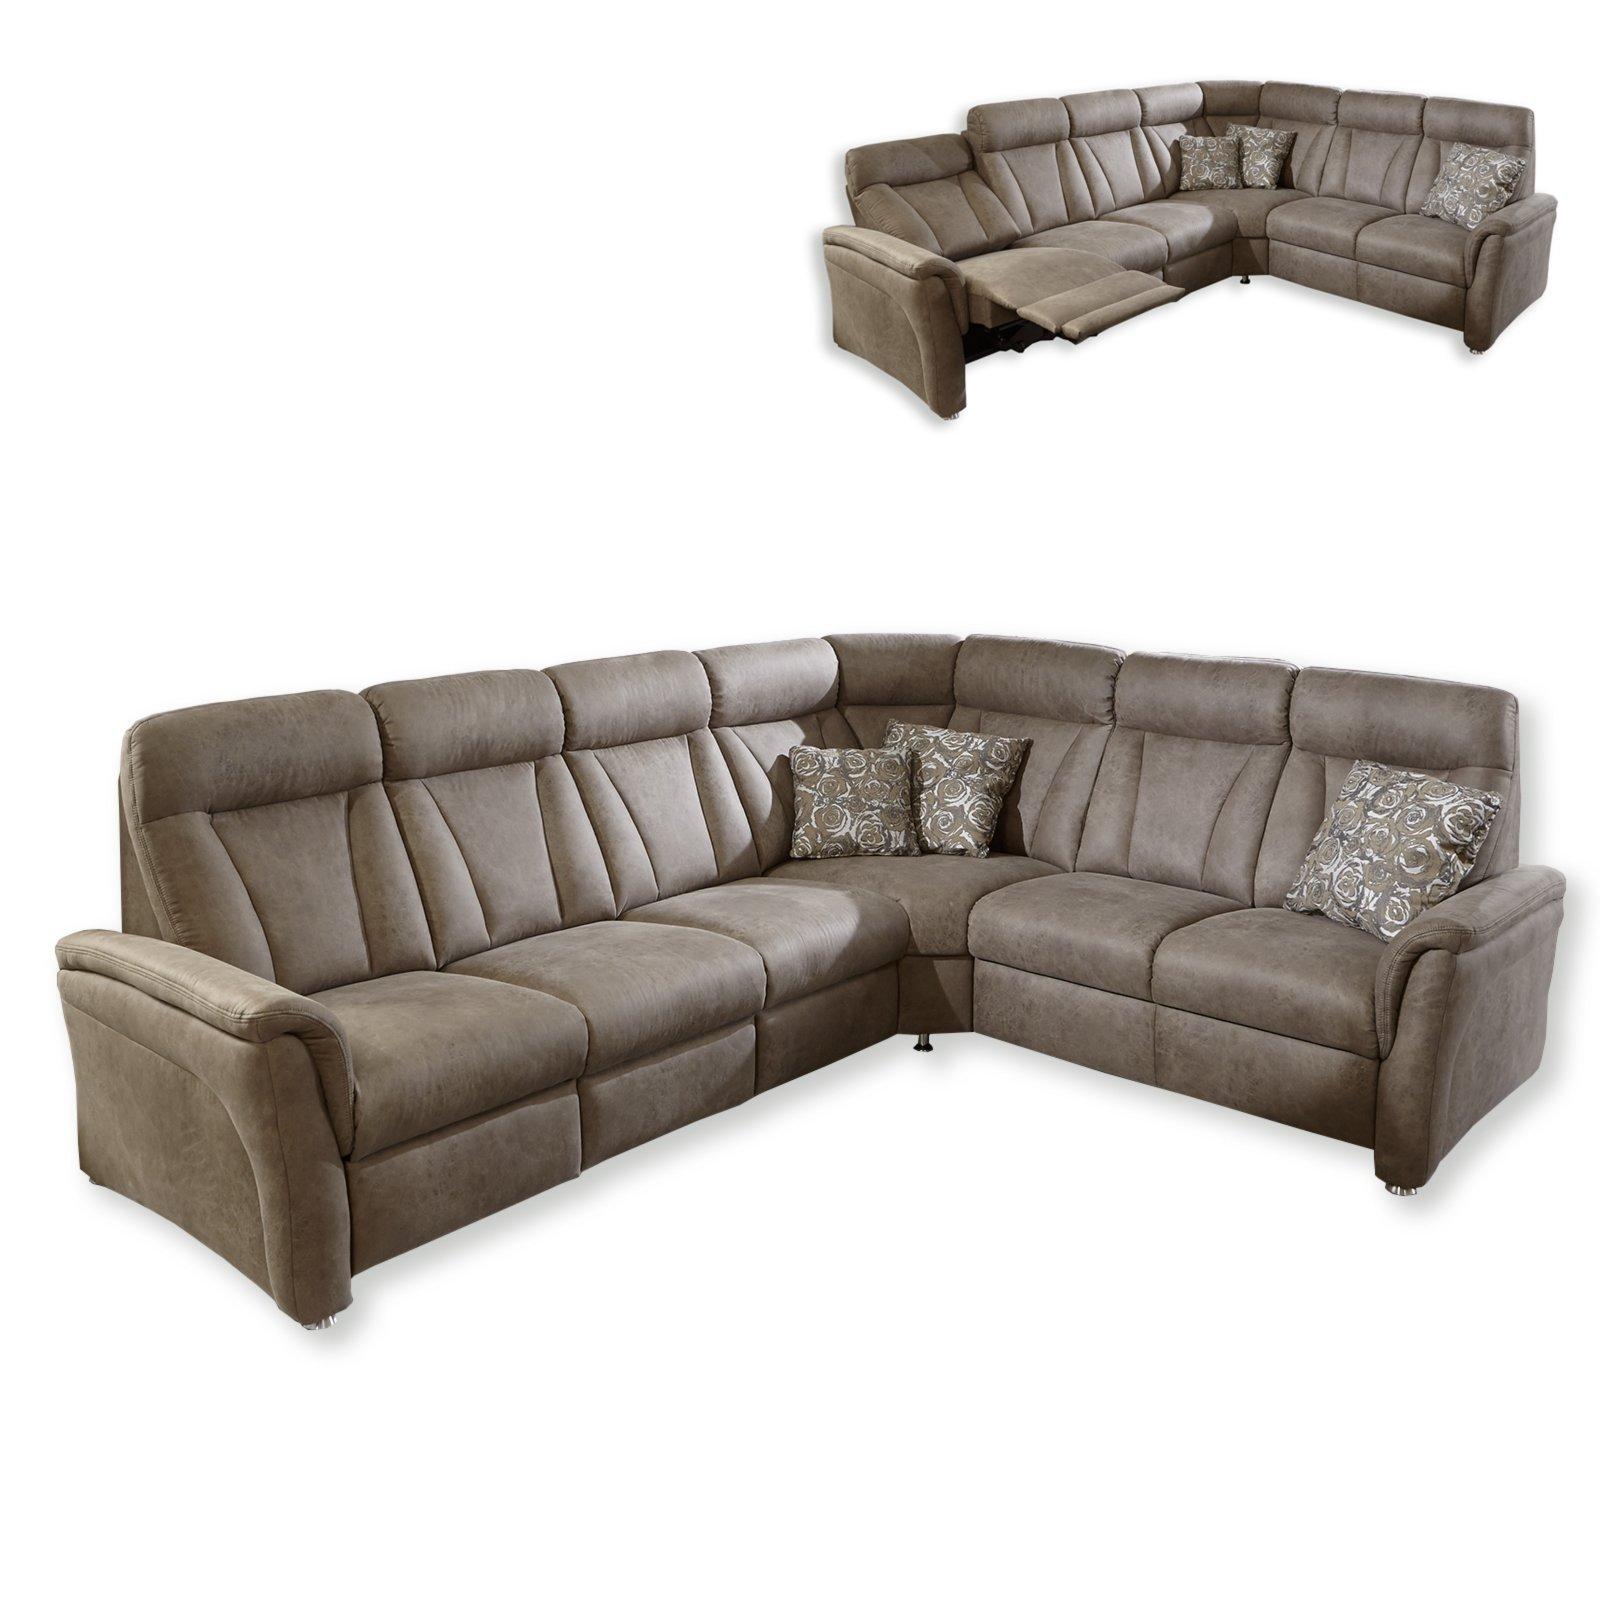 ecksofa smoke wallaway funktion ecksofas l form sofas couches m bel roller. Black Bedroom Furniture Sets. Home Design Ideas